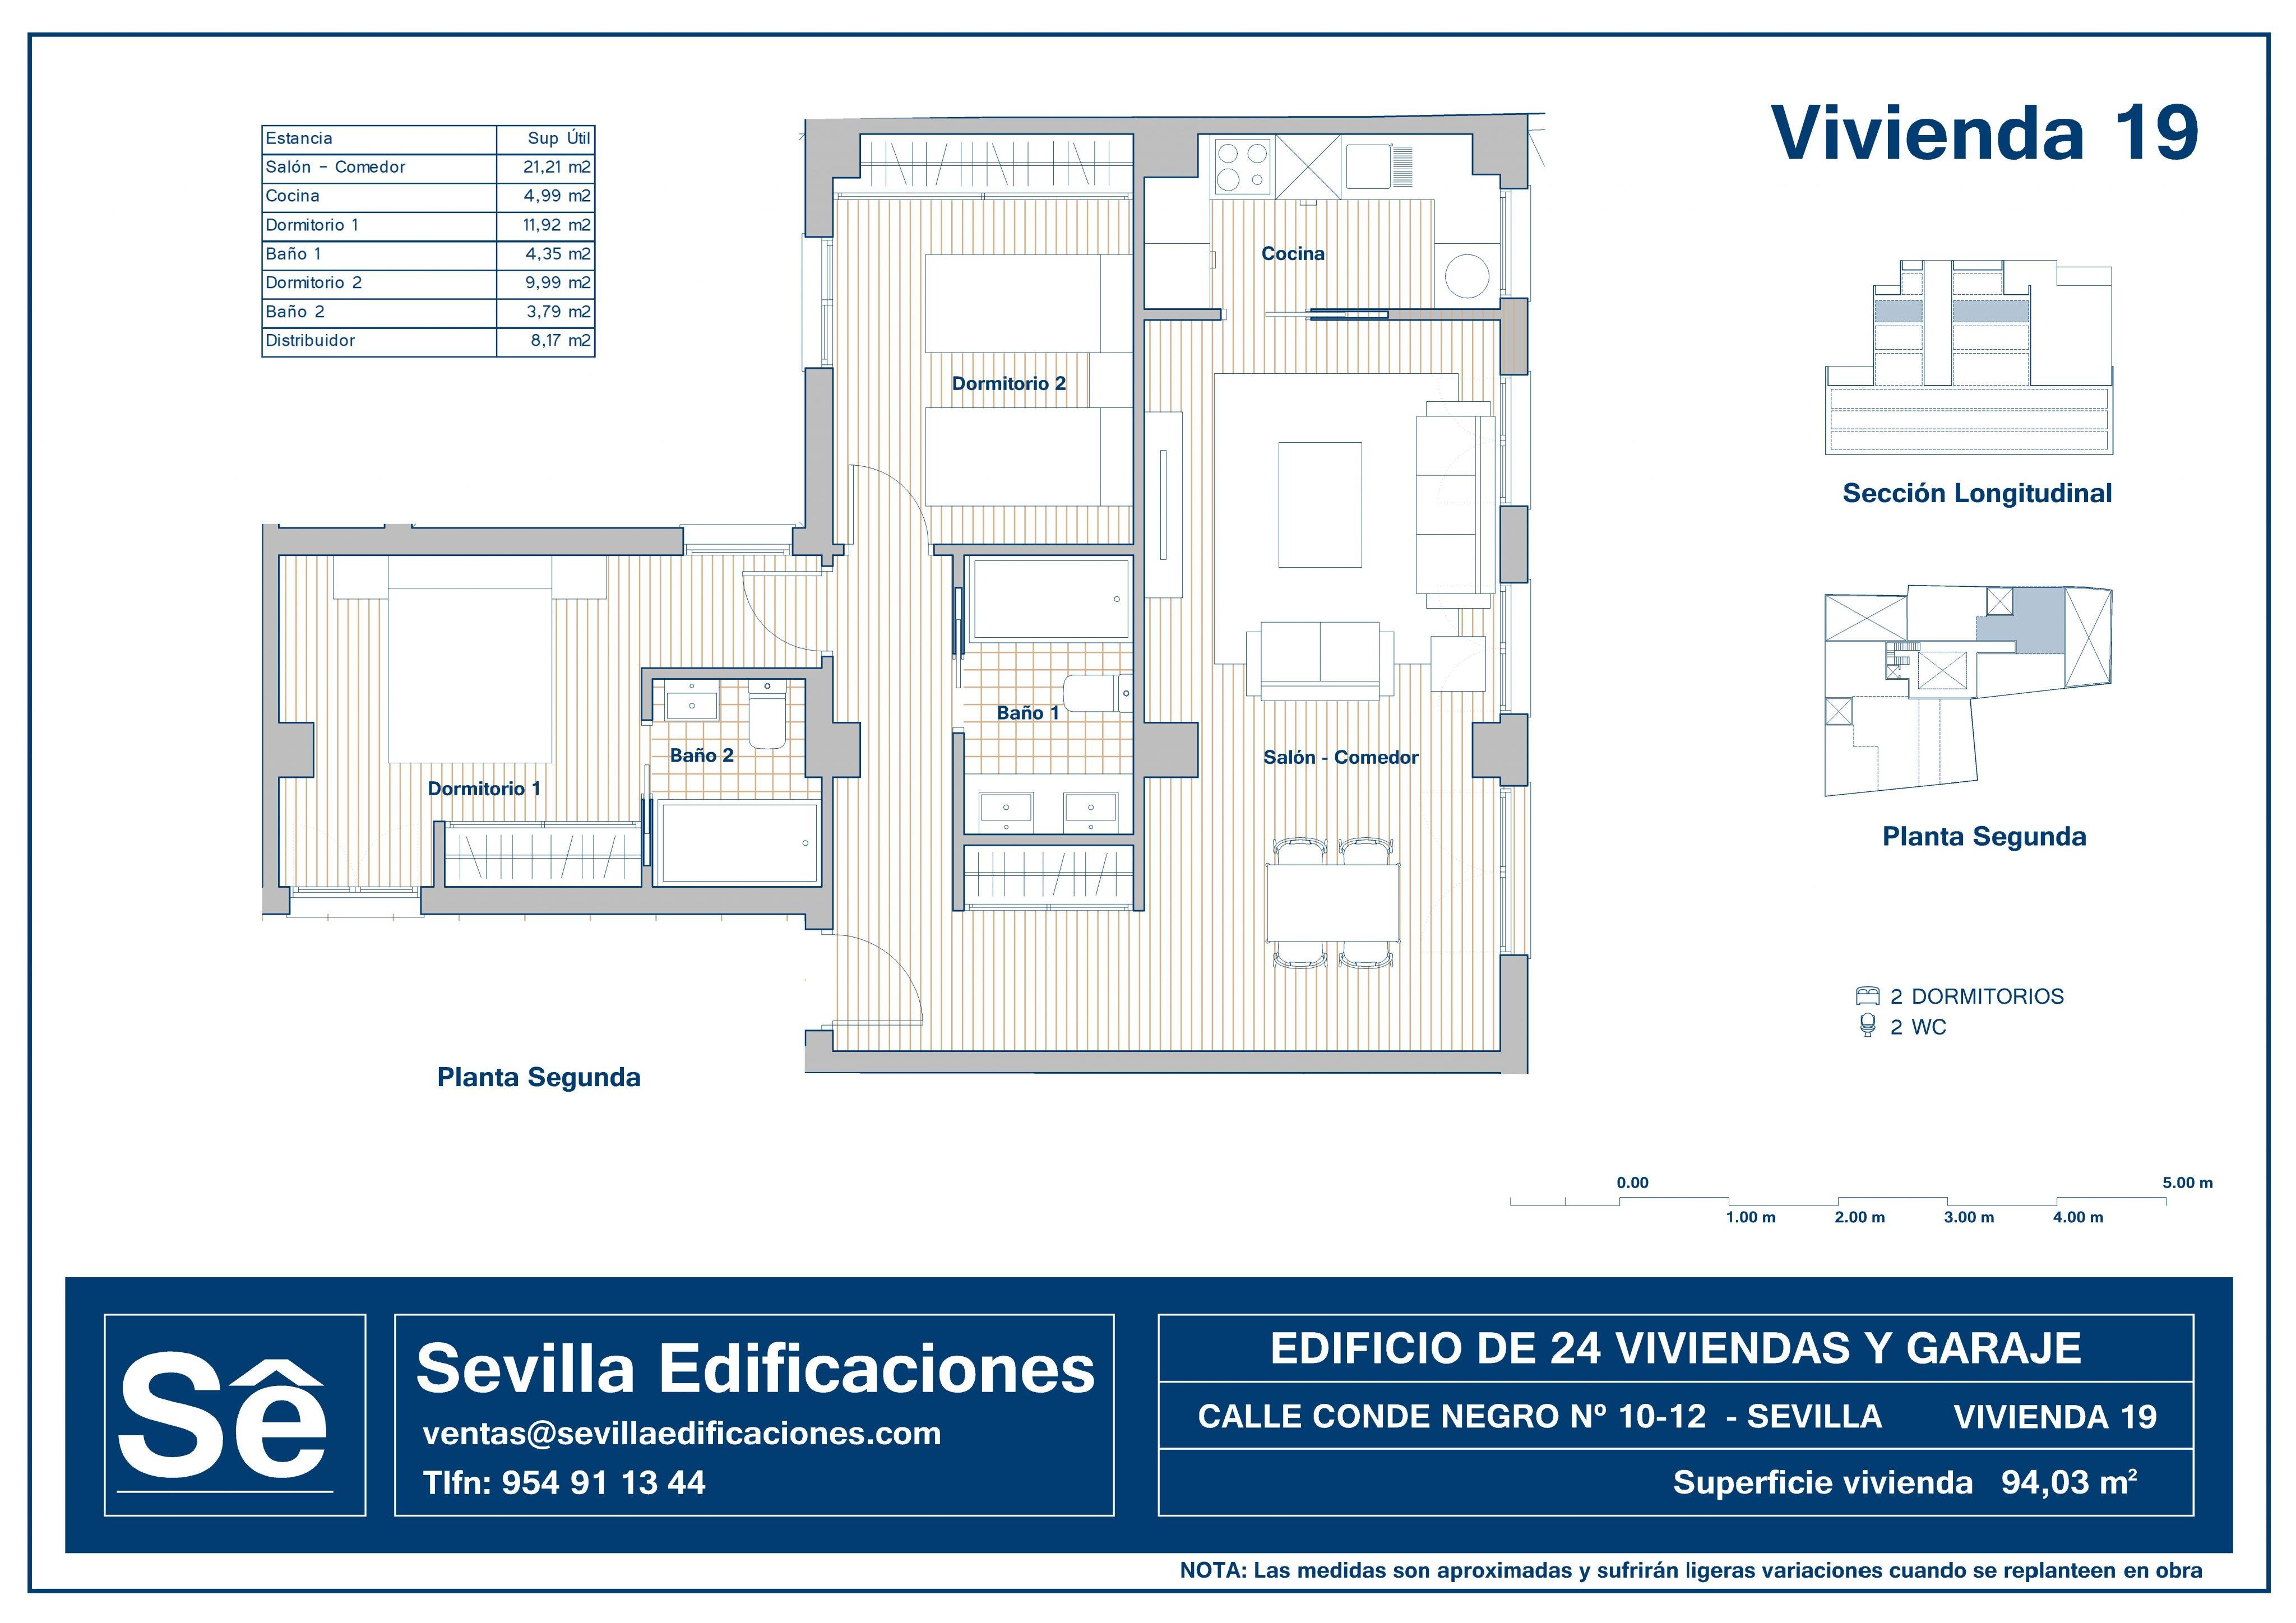 CONDENEGRO_VIVIENDA_19